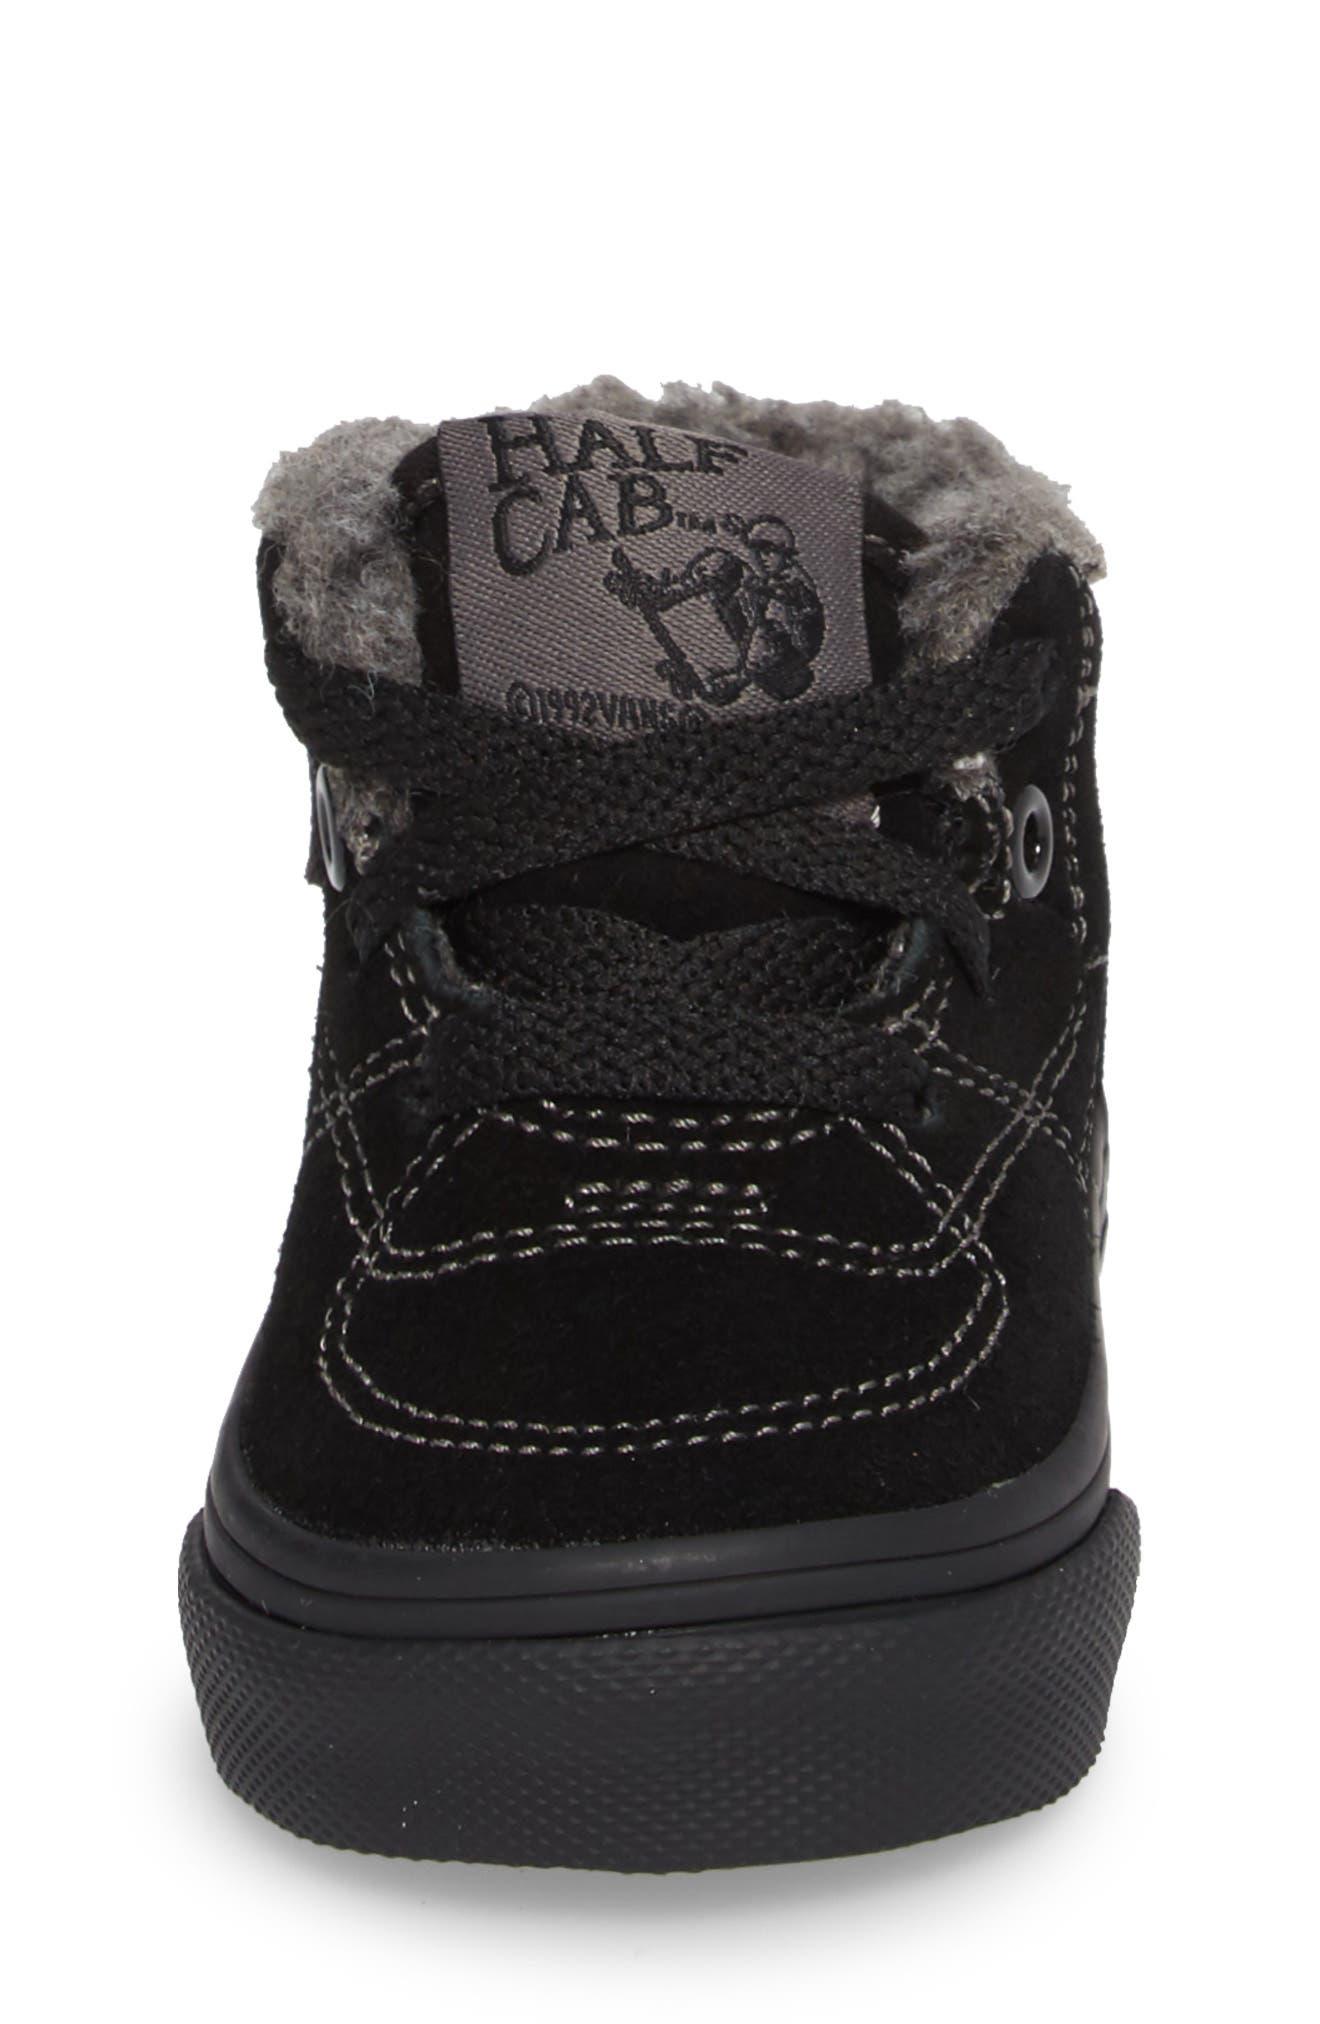 Half Cab Sneaker,                             Alternate thumbnail 4, color,                             001